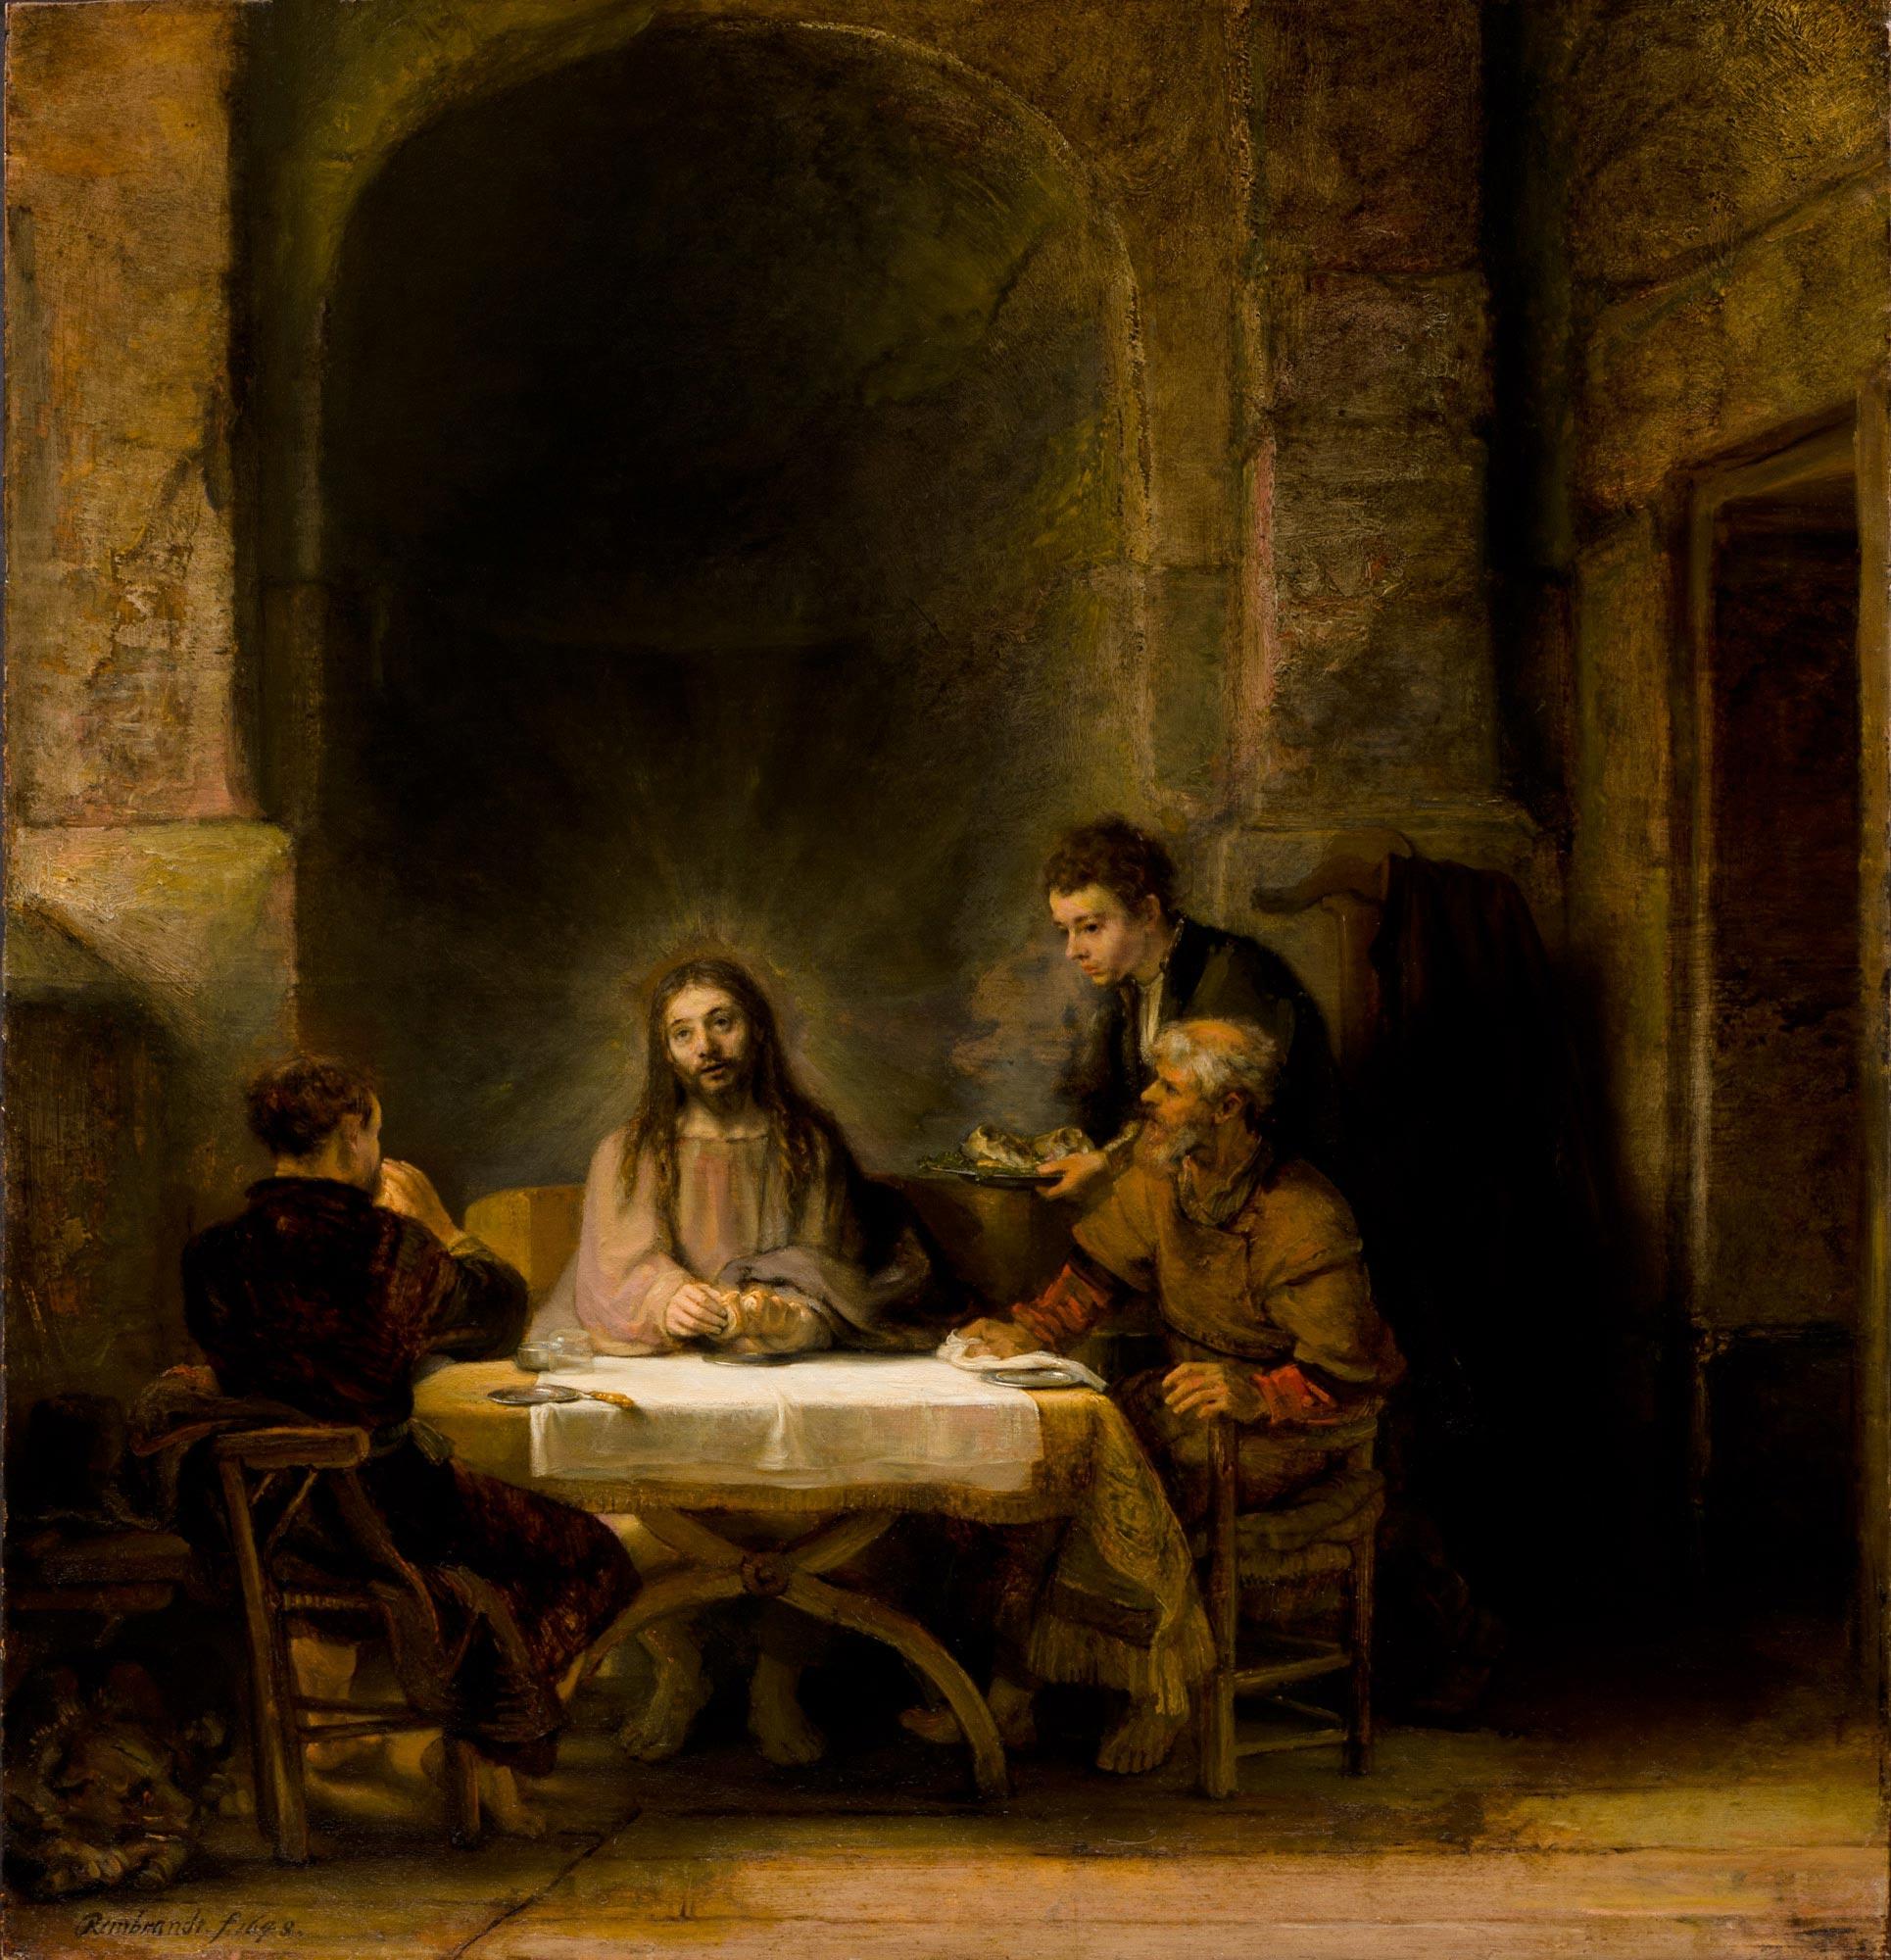 Rembrandt - Emmaus Road Jesus with Disciples.jpg